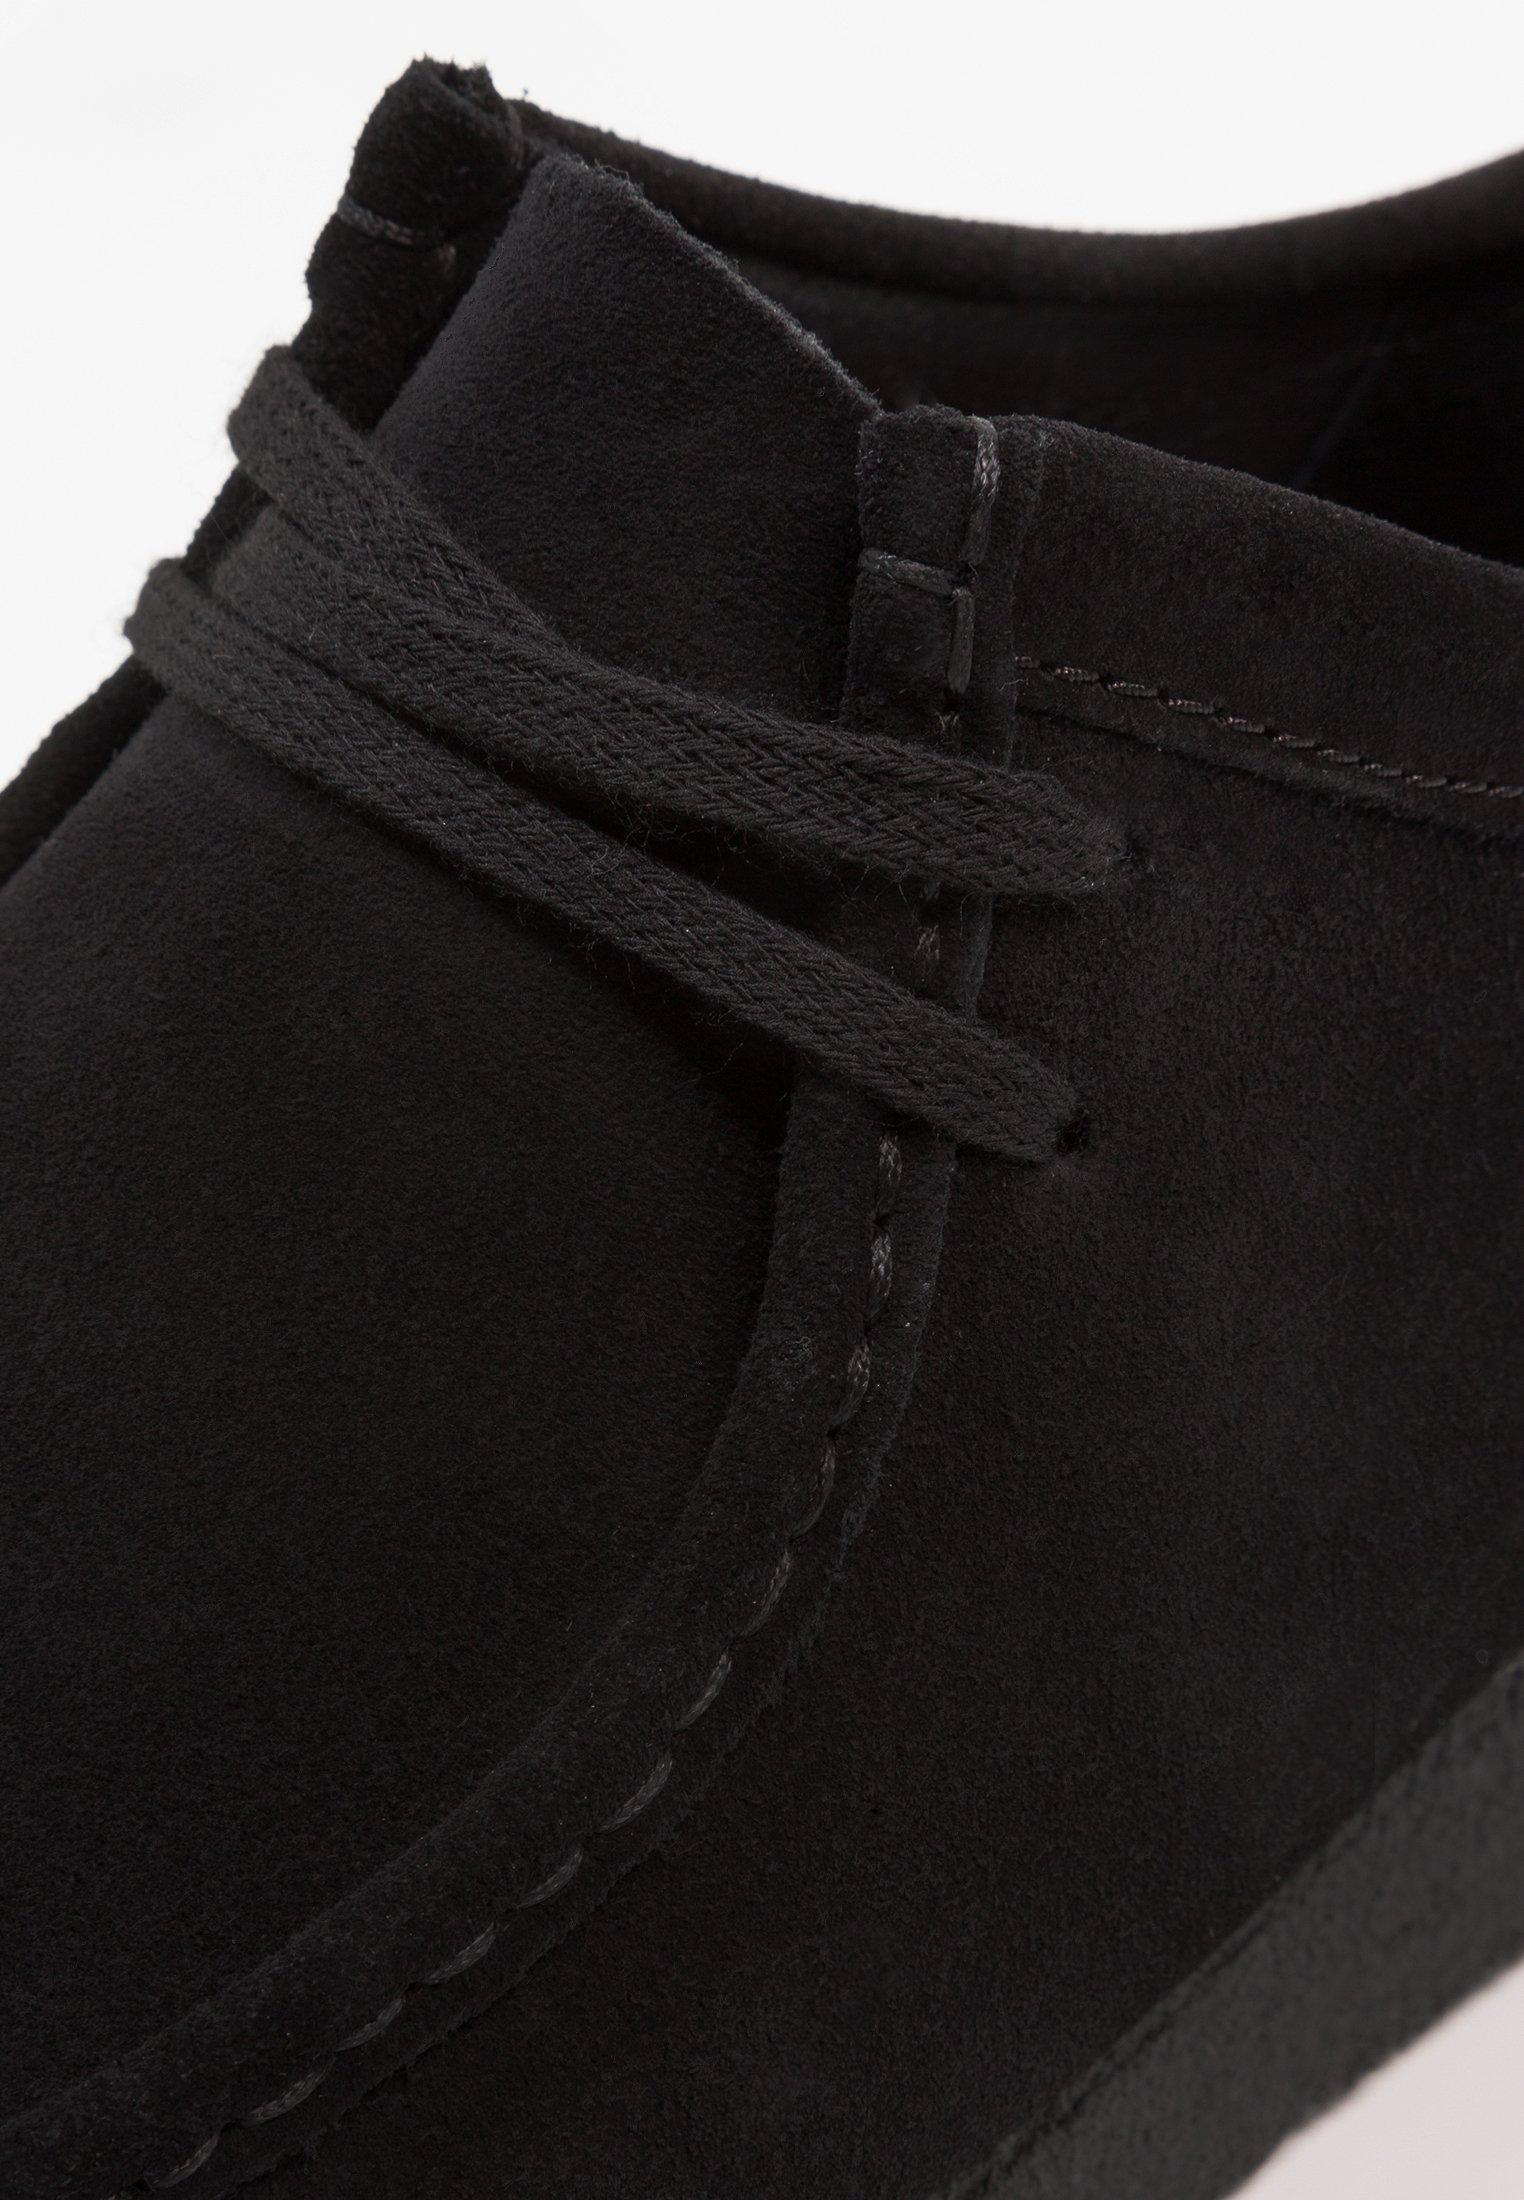 Clarks Originals Wallabee-schnürsenkel-weiss - Casual Lace-ups Black